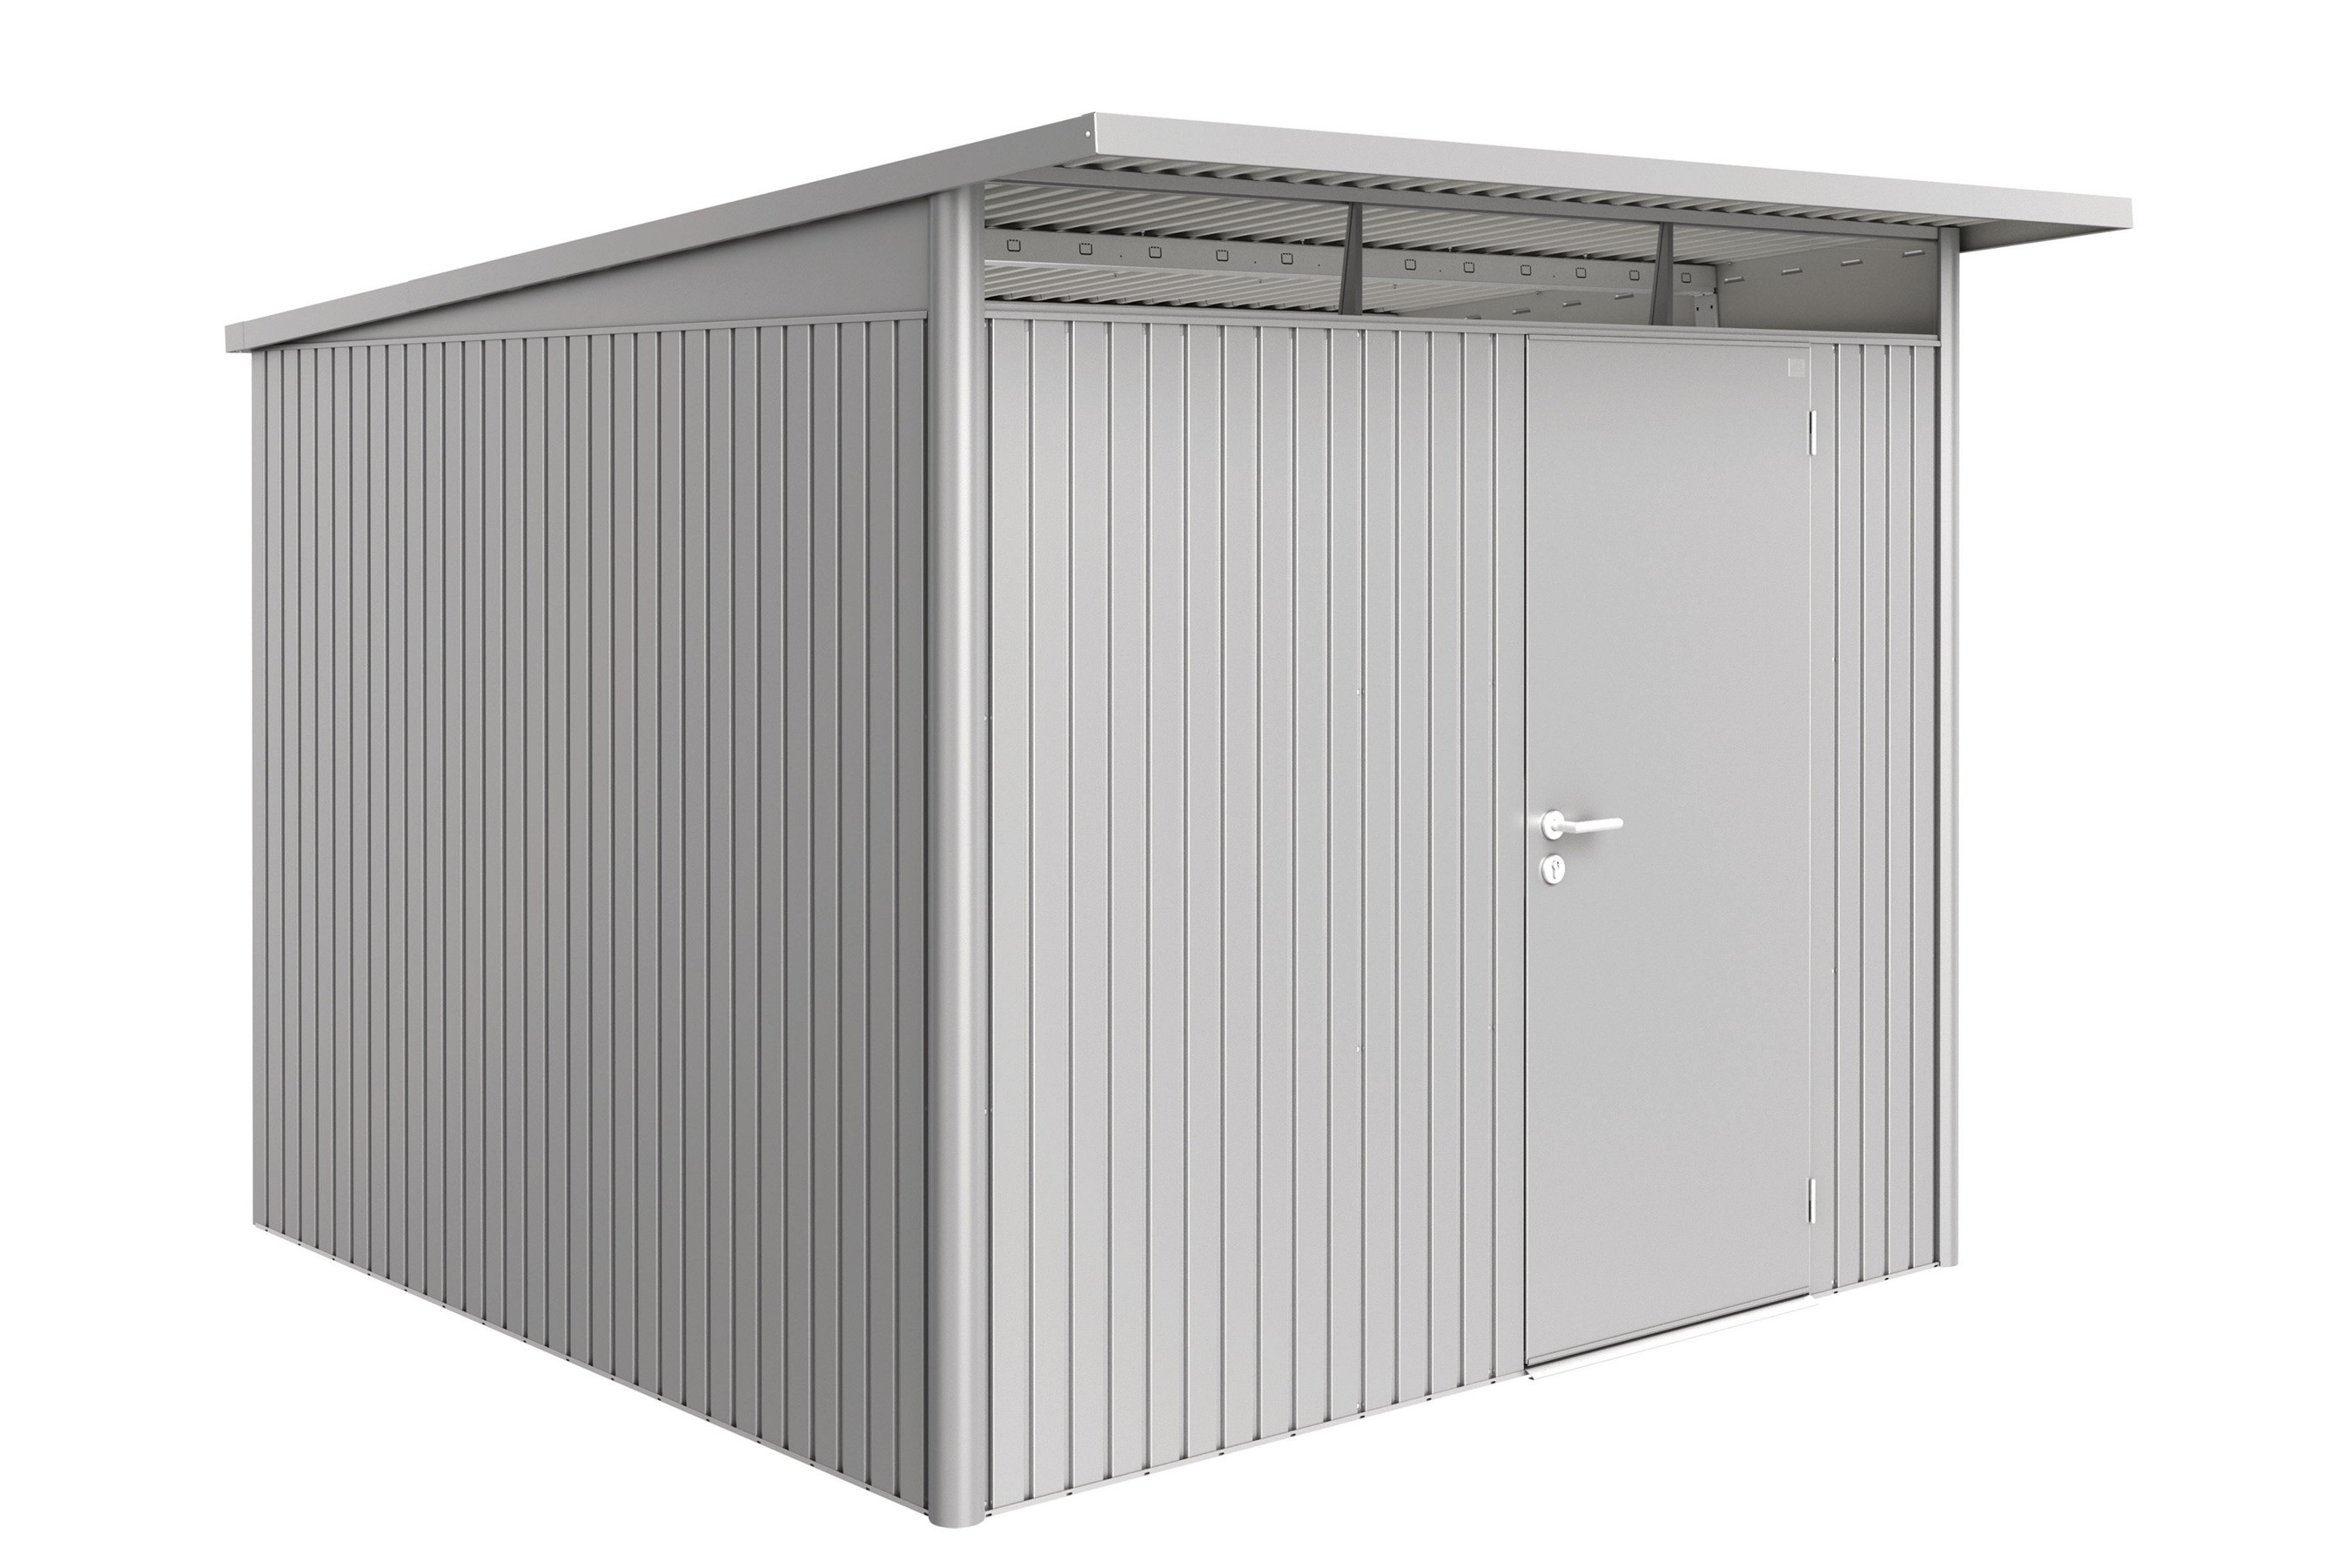 Gerätehaus Biohort AvantGarde Gr. XL silber-metallic 260x300cm Bild 1